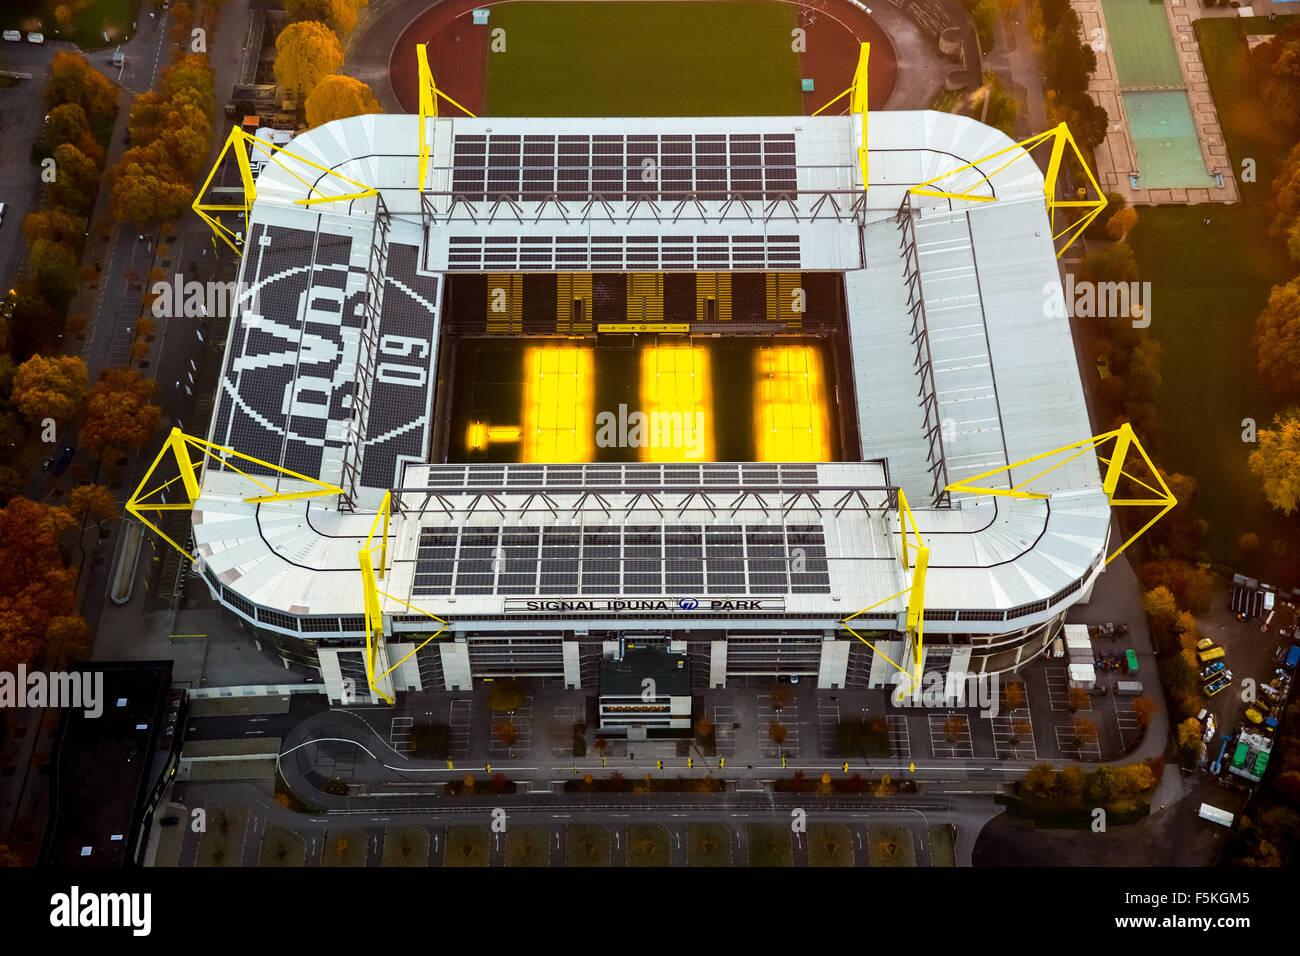 Signal Iduna Park, Signal-Iduna-Park, Borussia Dortmund, BVB O9, Stadium with Turf heating, national league football - Stock Image